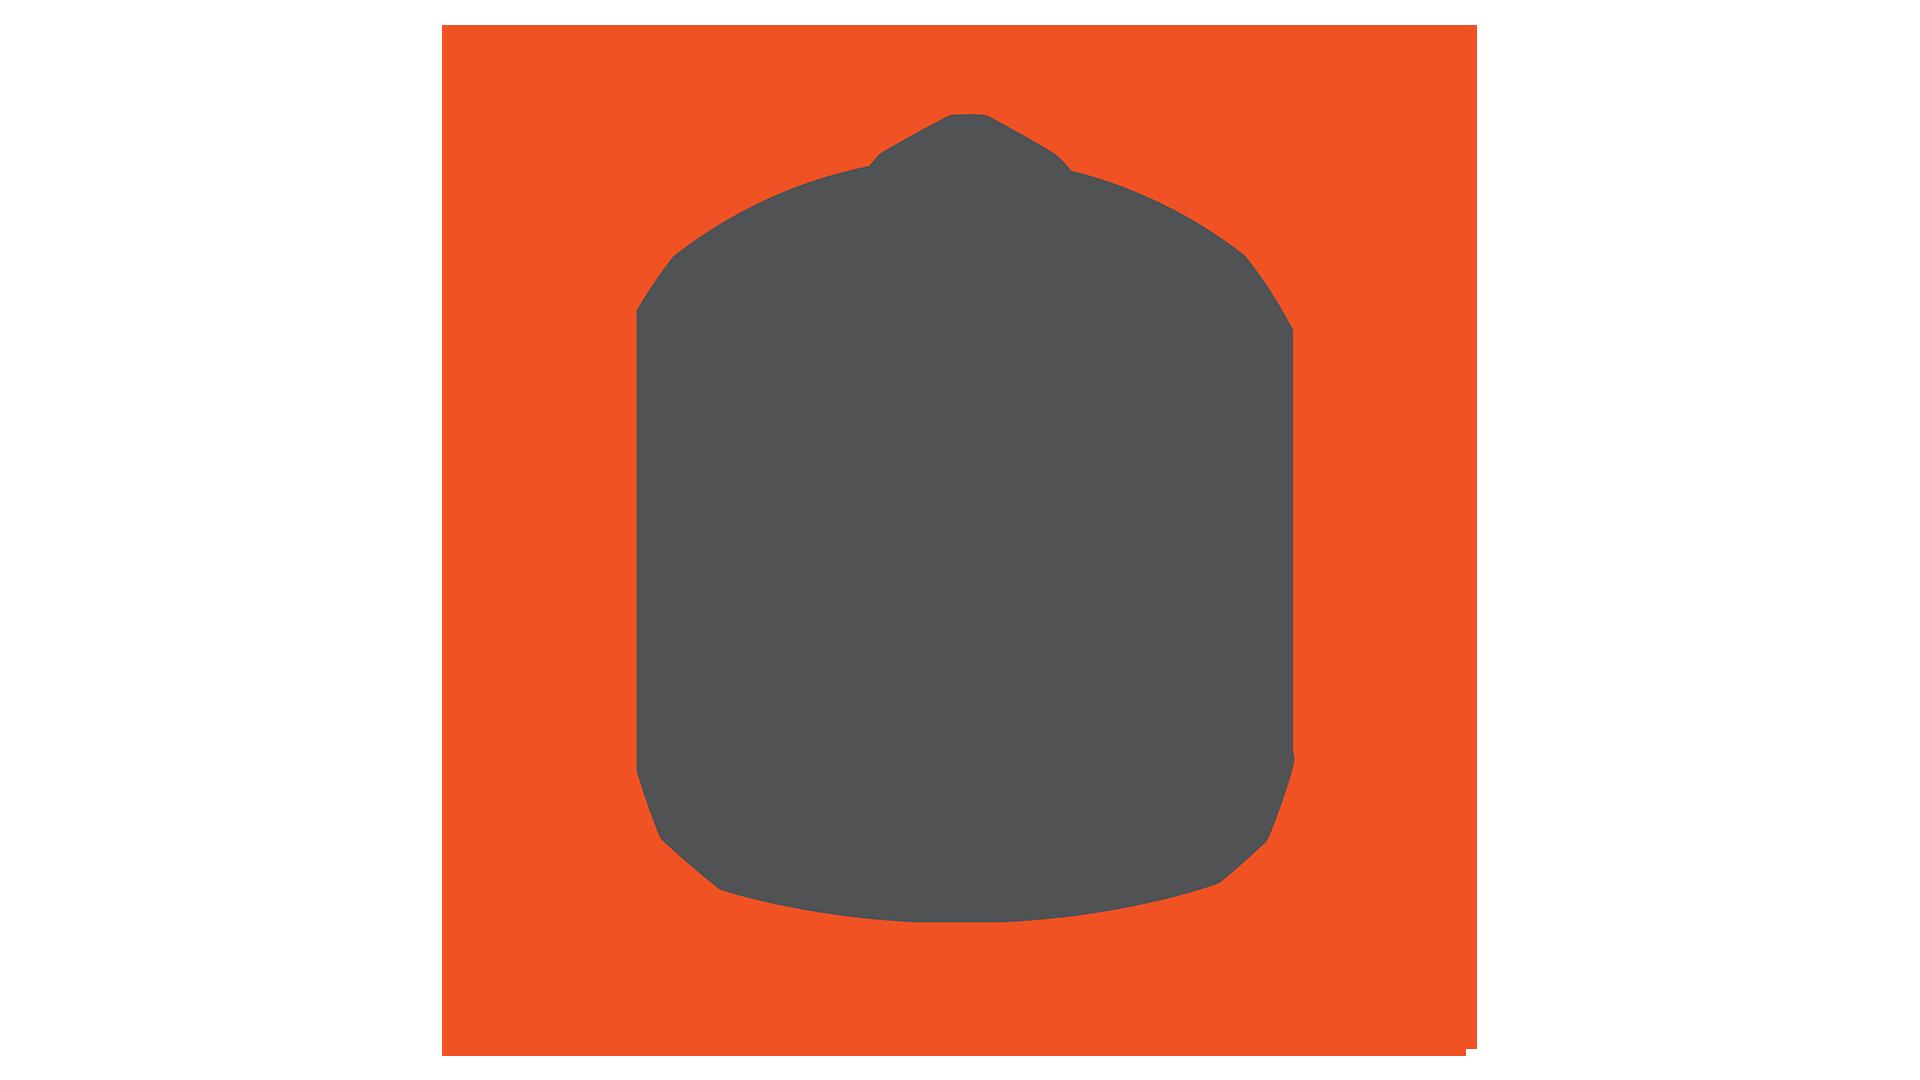 Government_Symbols (1080p)